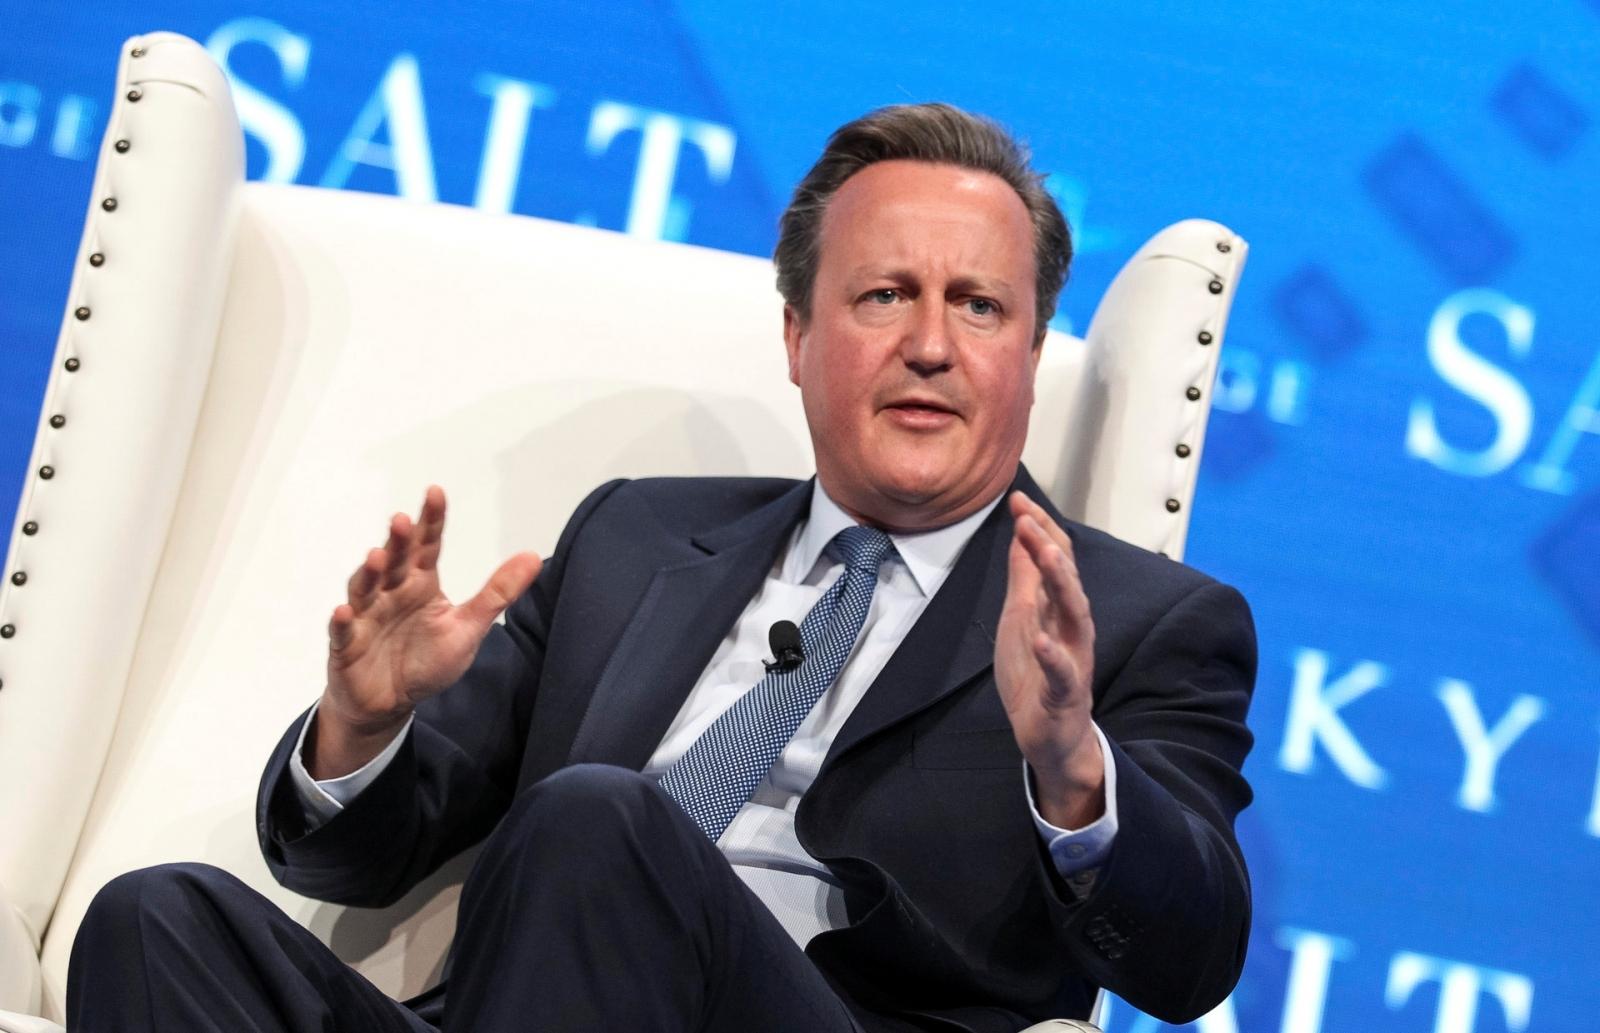 David Cameron criticises Donald Trump for 'fake news' attacks on media